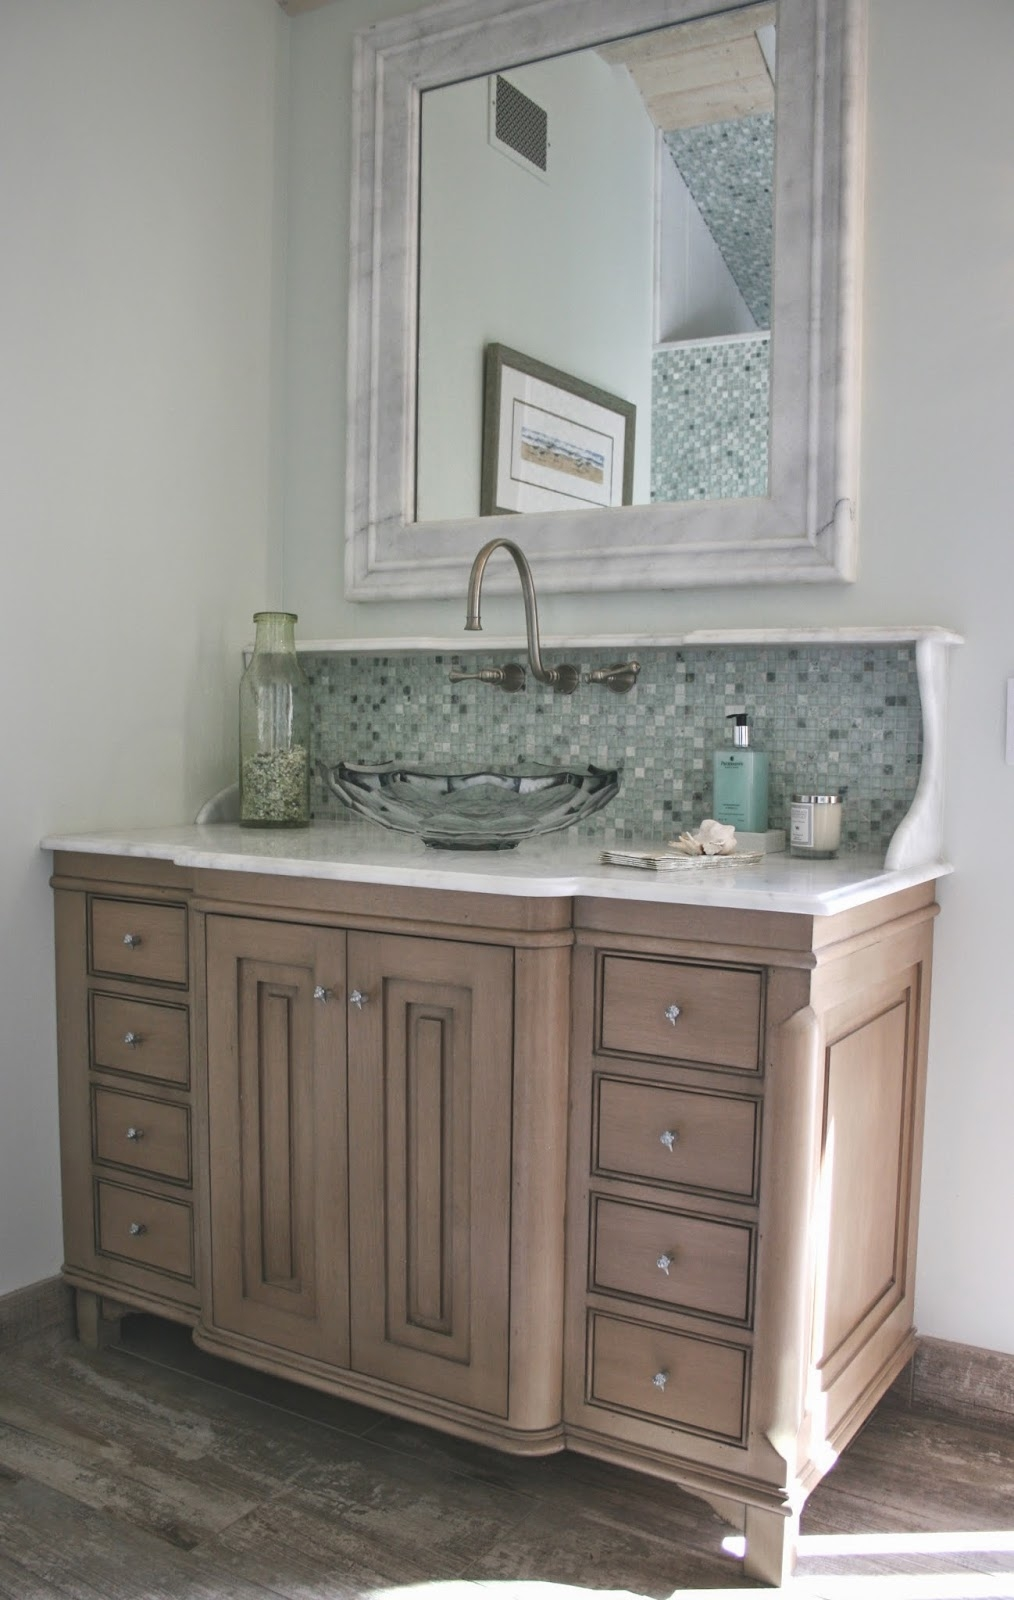 Rustic Cabin Bath 4-Light Unique Mirror Lighting Industrial Restroom Wood Vanity